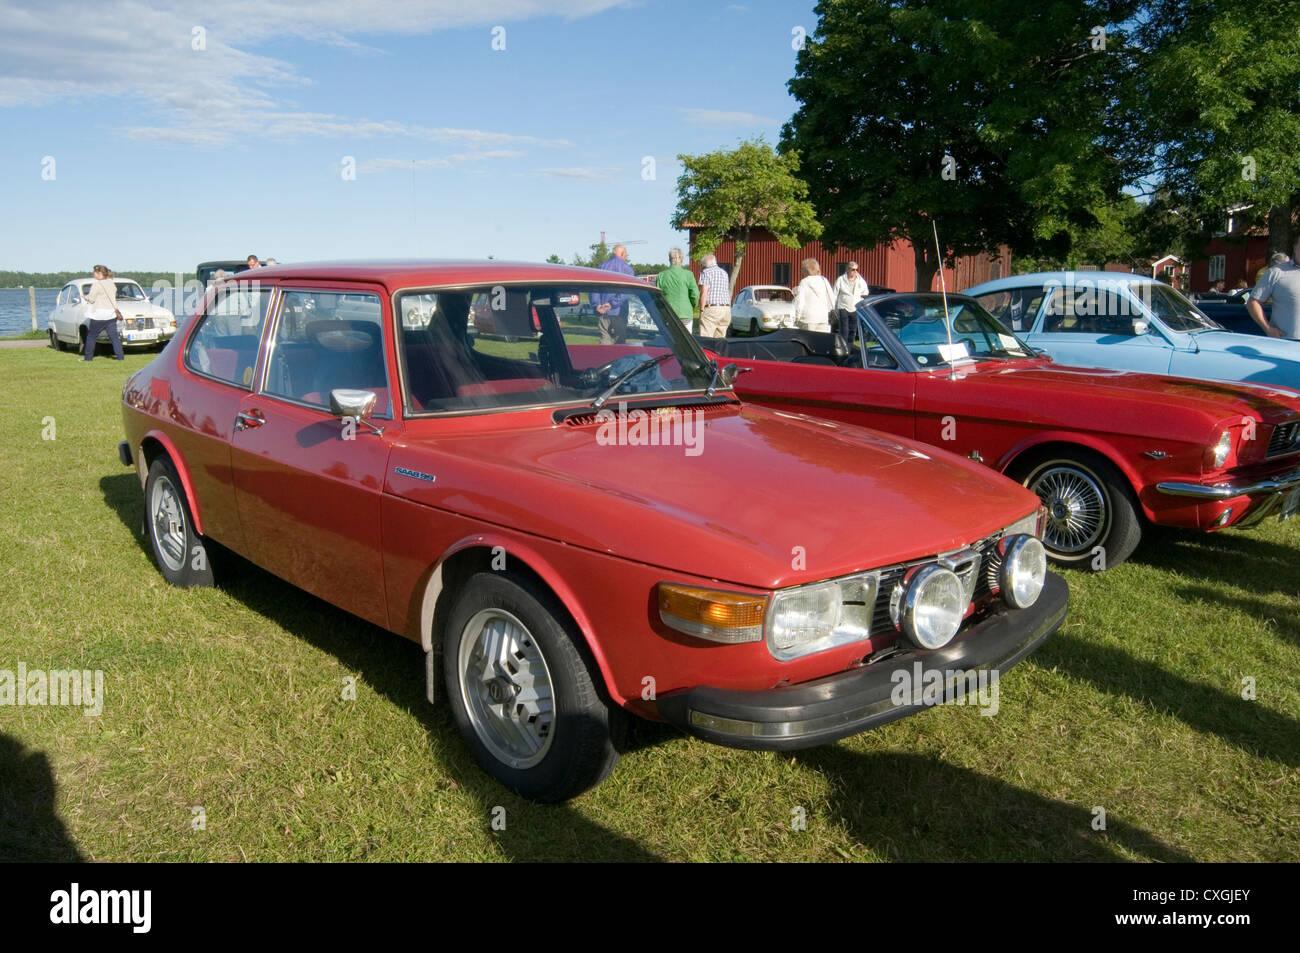 saab 99 turbo with inca wheels sweden swedish classic car cars - Stock Image